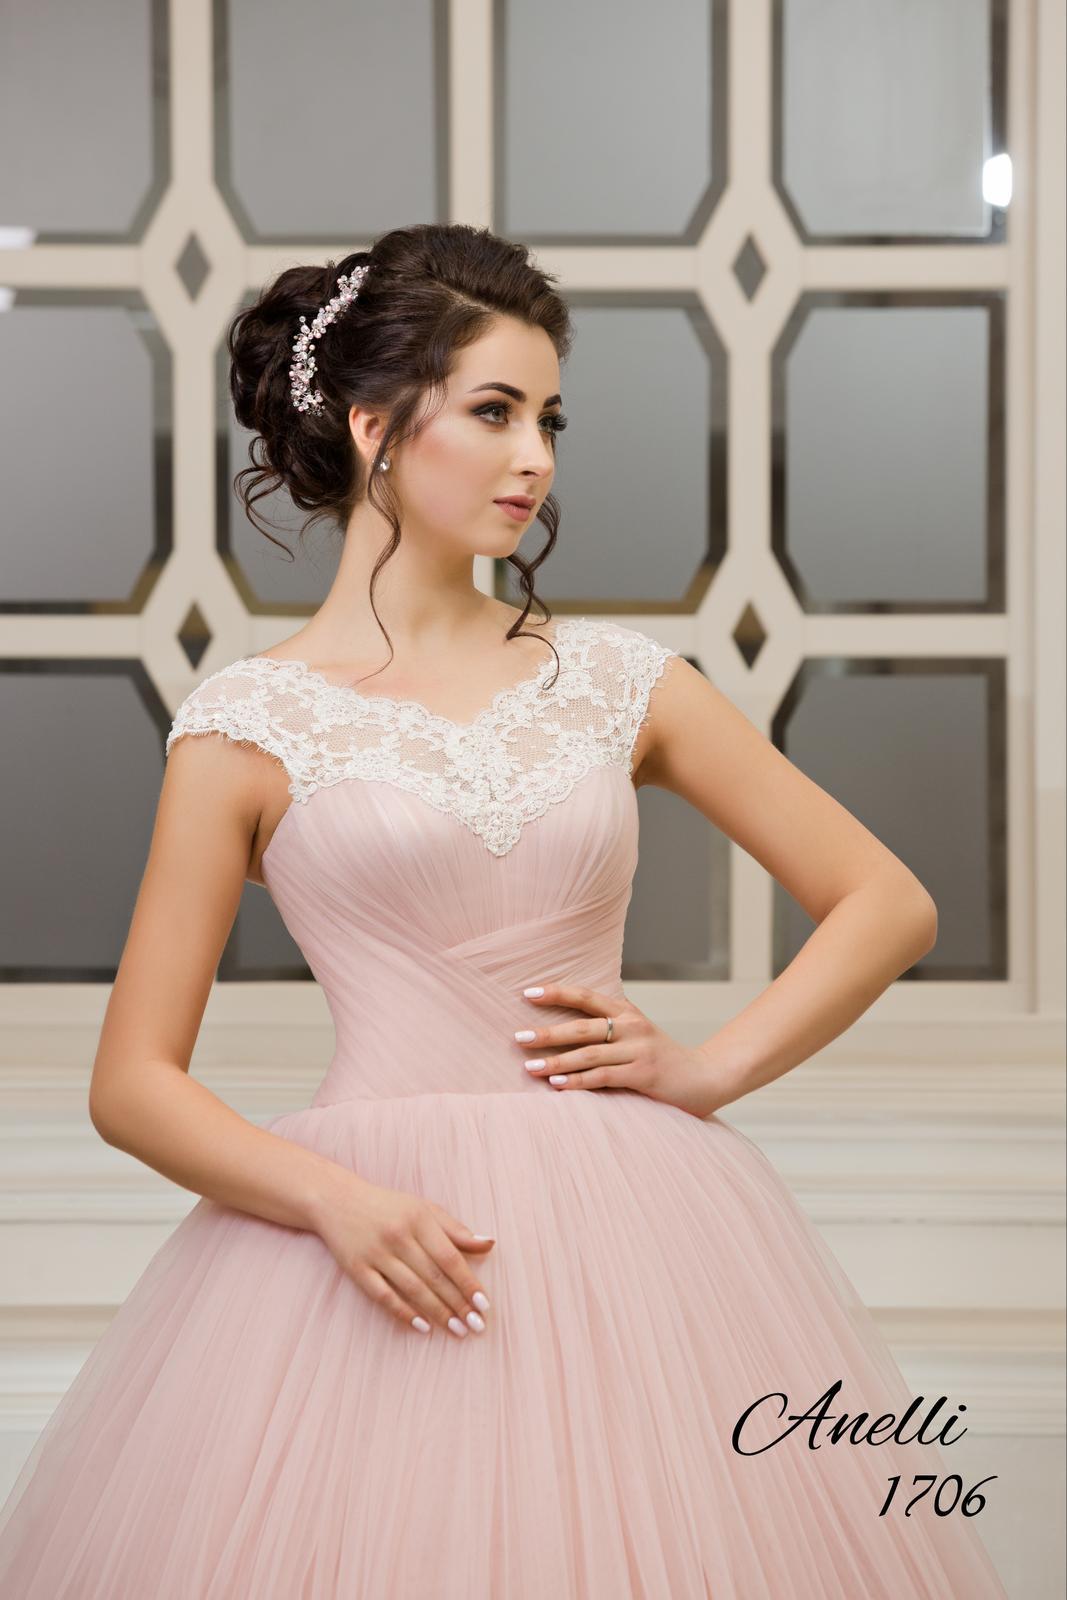 Svadobné šaty - Debut 1706 - Obrázok č. 2